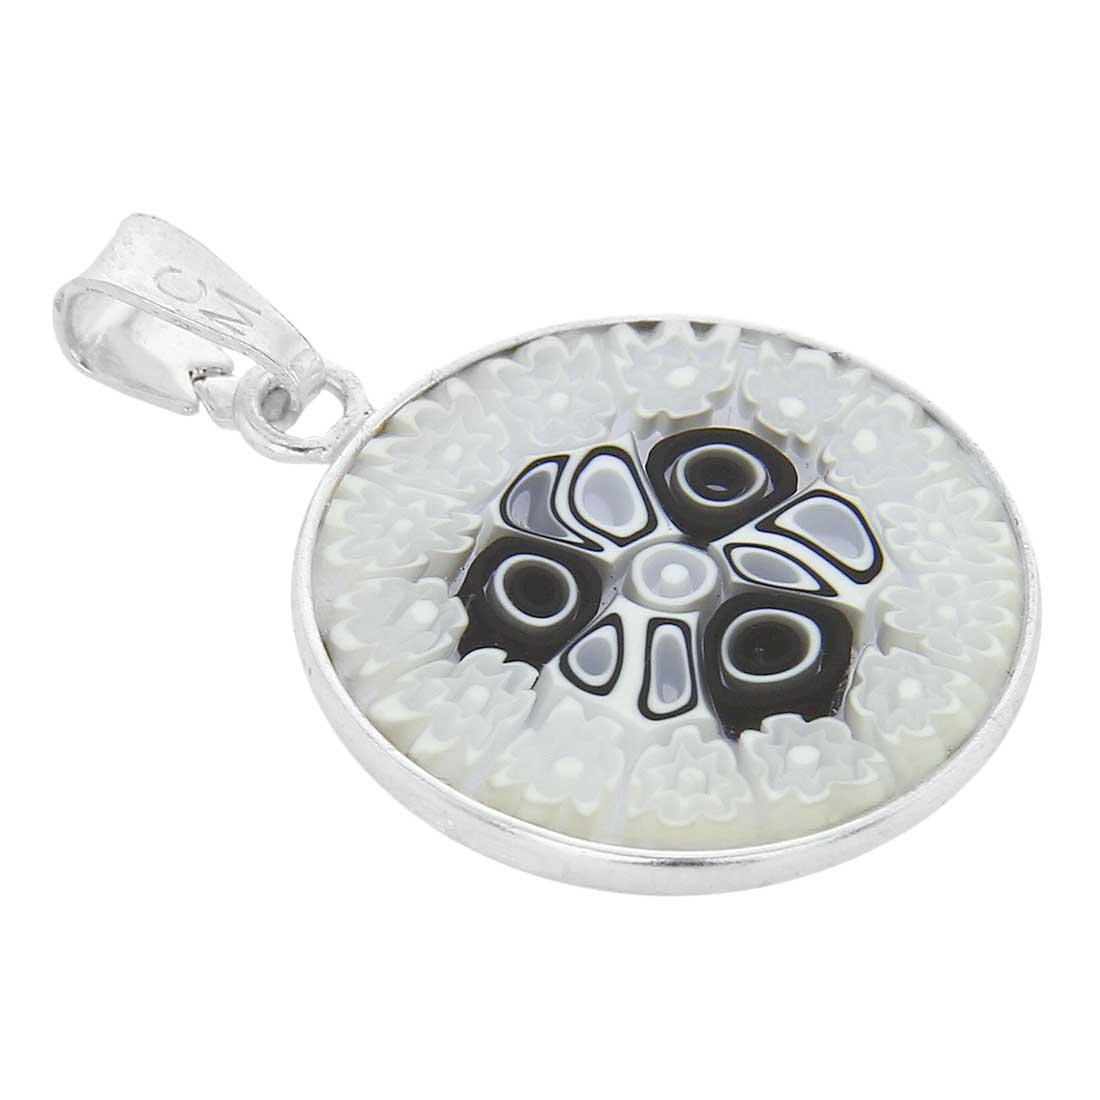 Small Millefiori Pendant in Sterling Silver Frame 18mm